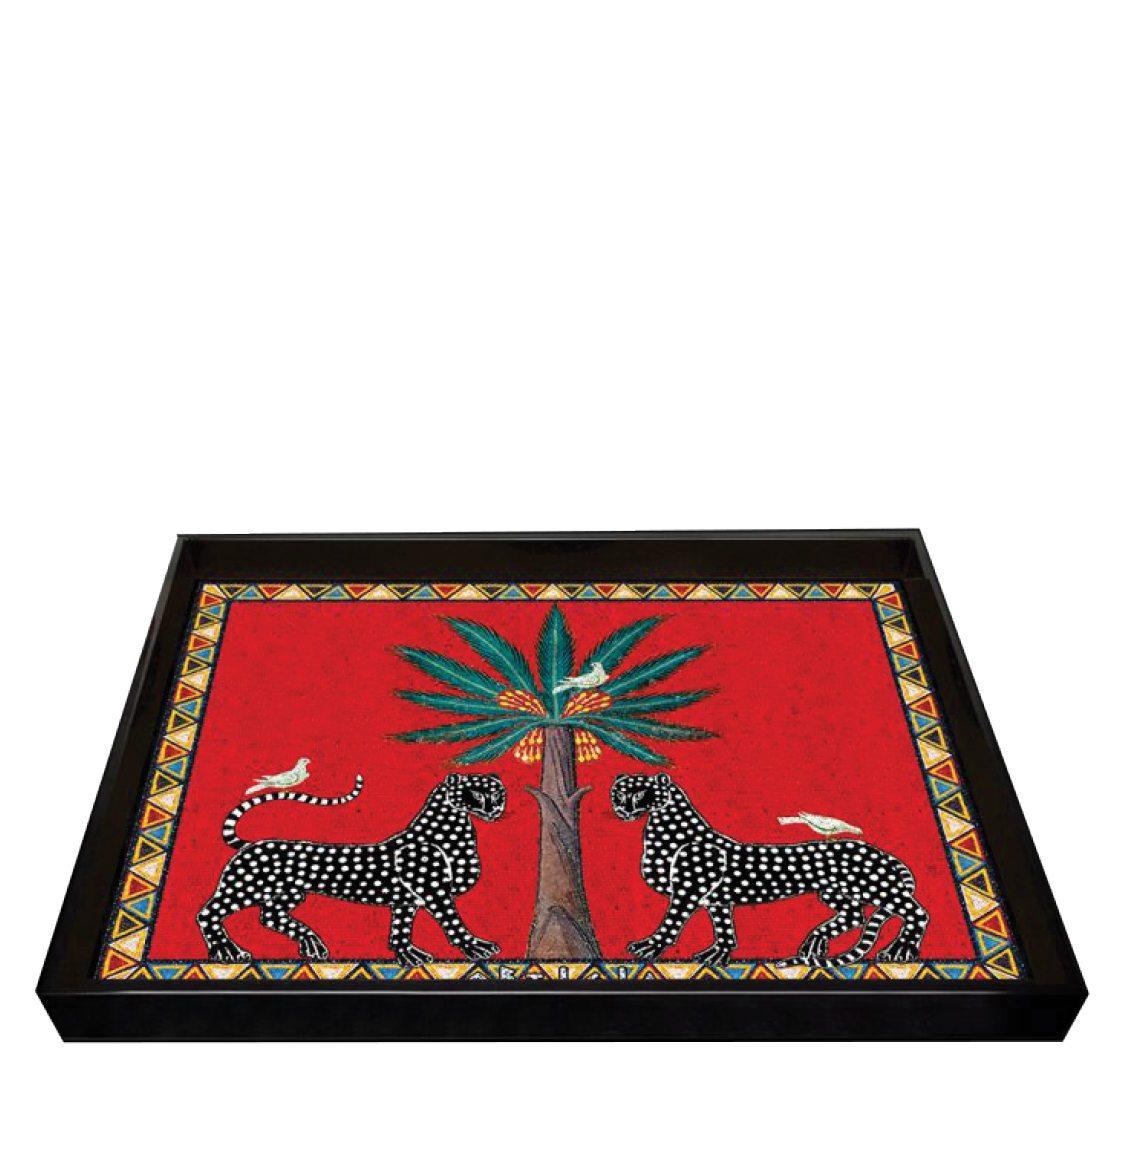 Ortigia Sicilia Hand-Made High-shine Lacquered Wood Tray Red Mosaico